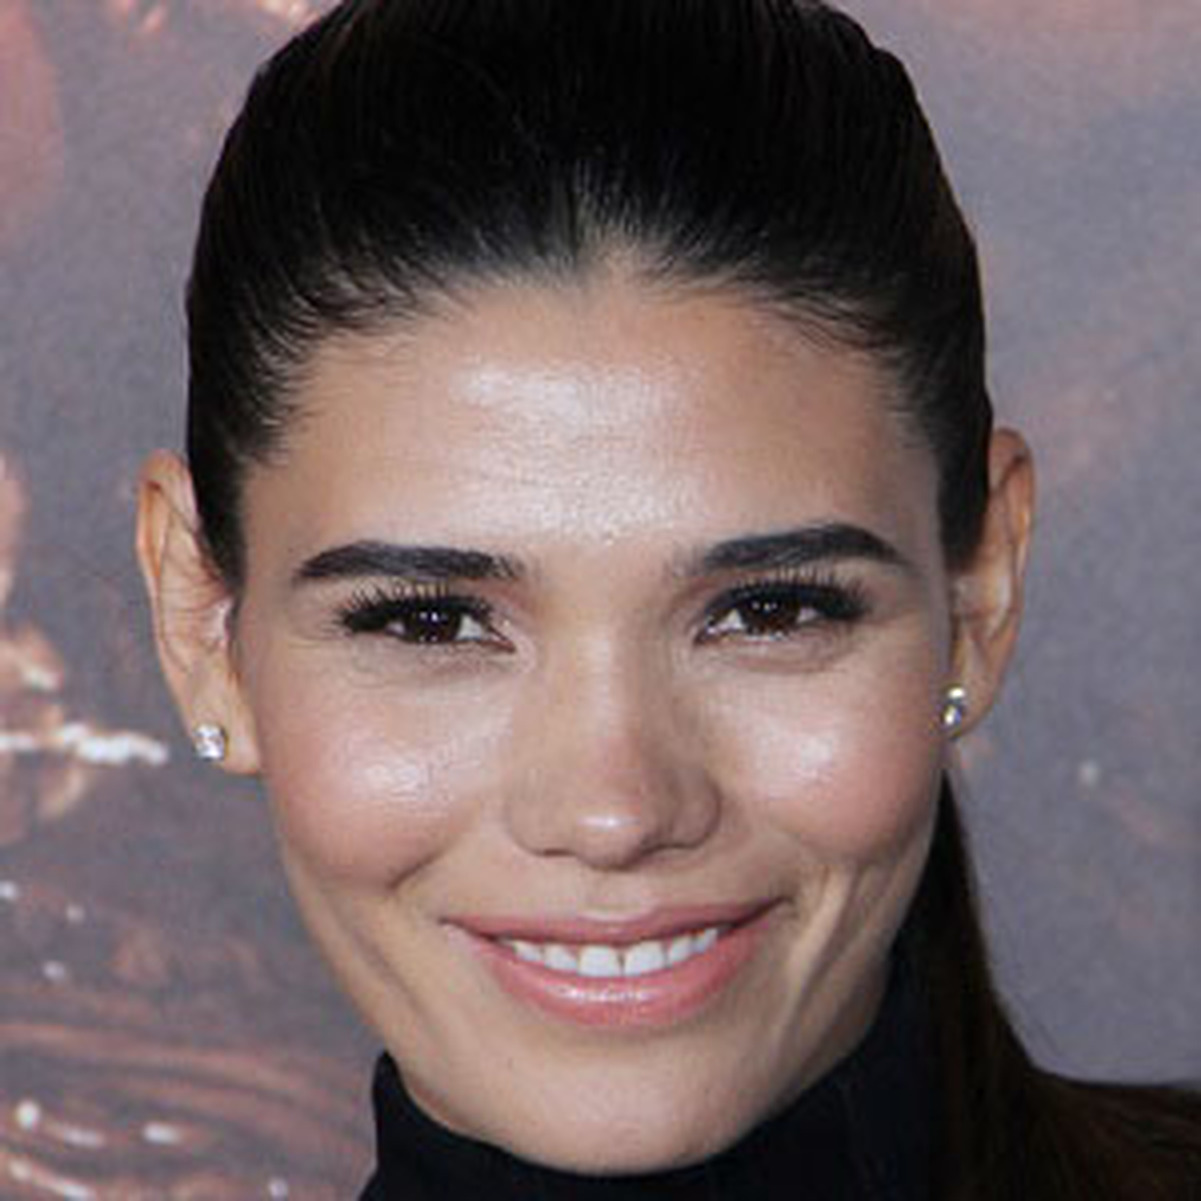 Paloma Jimenez